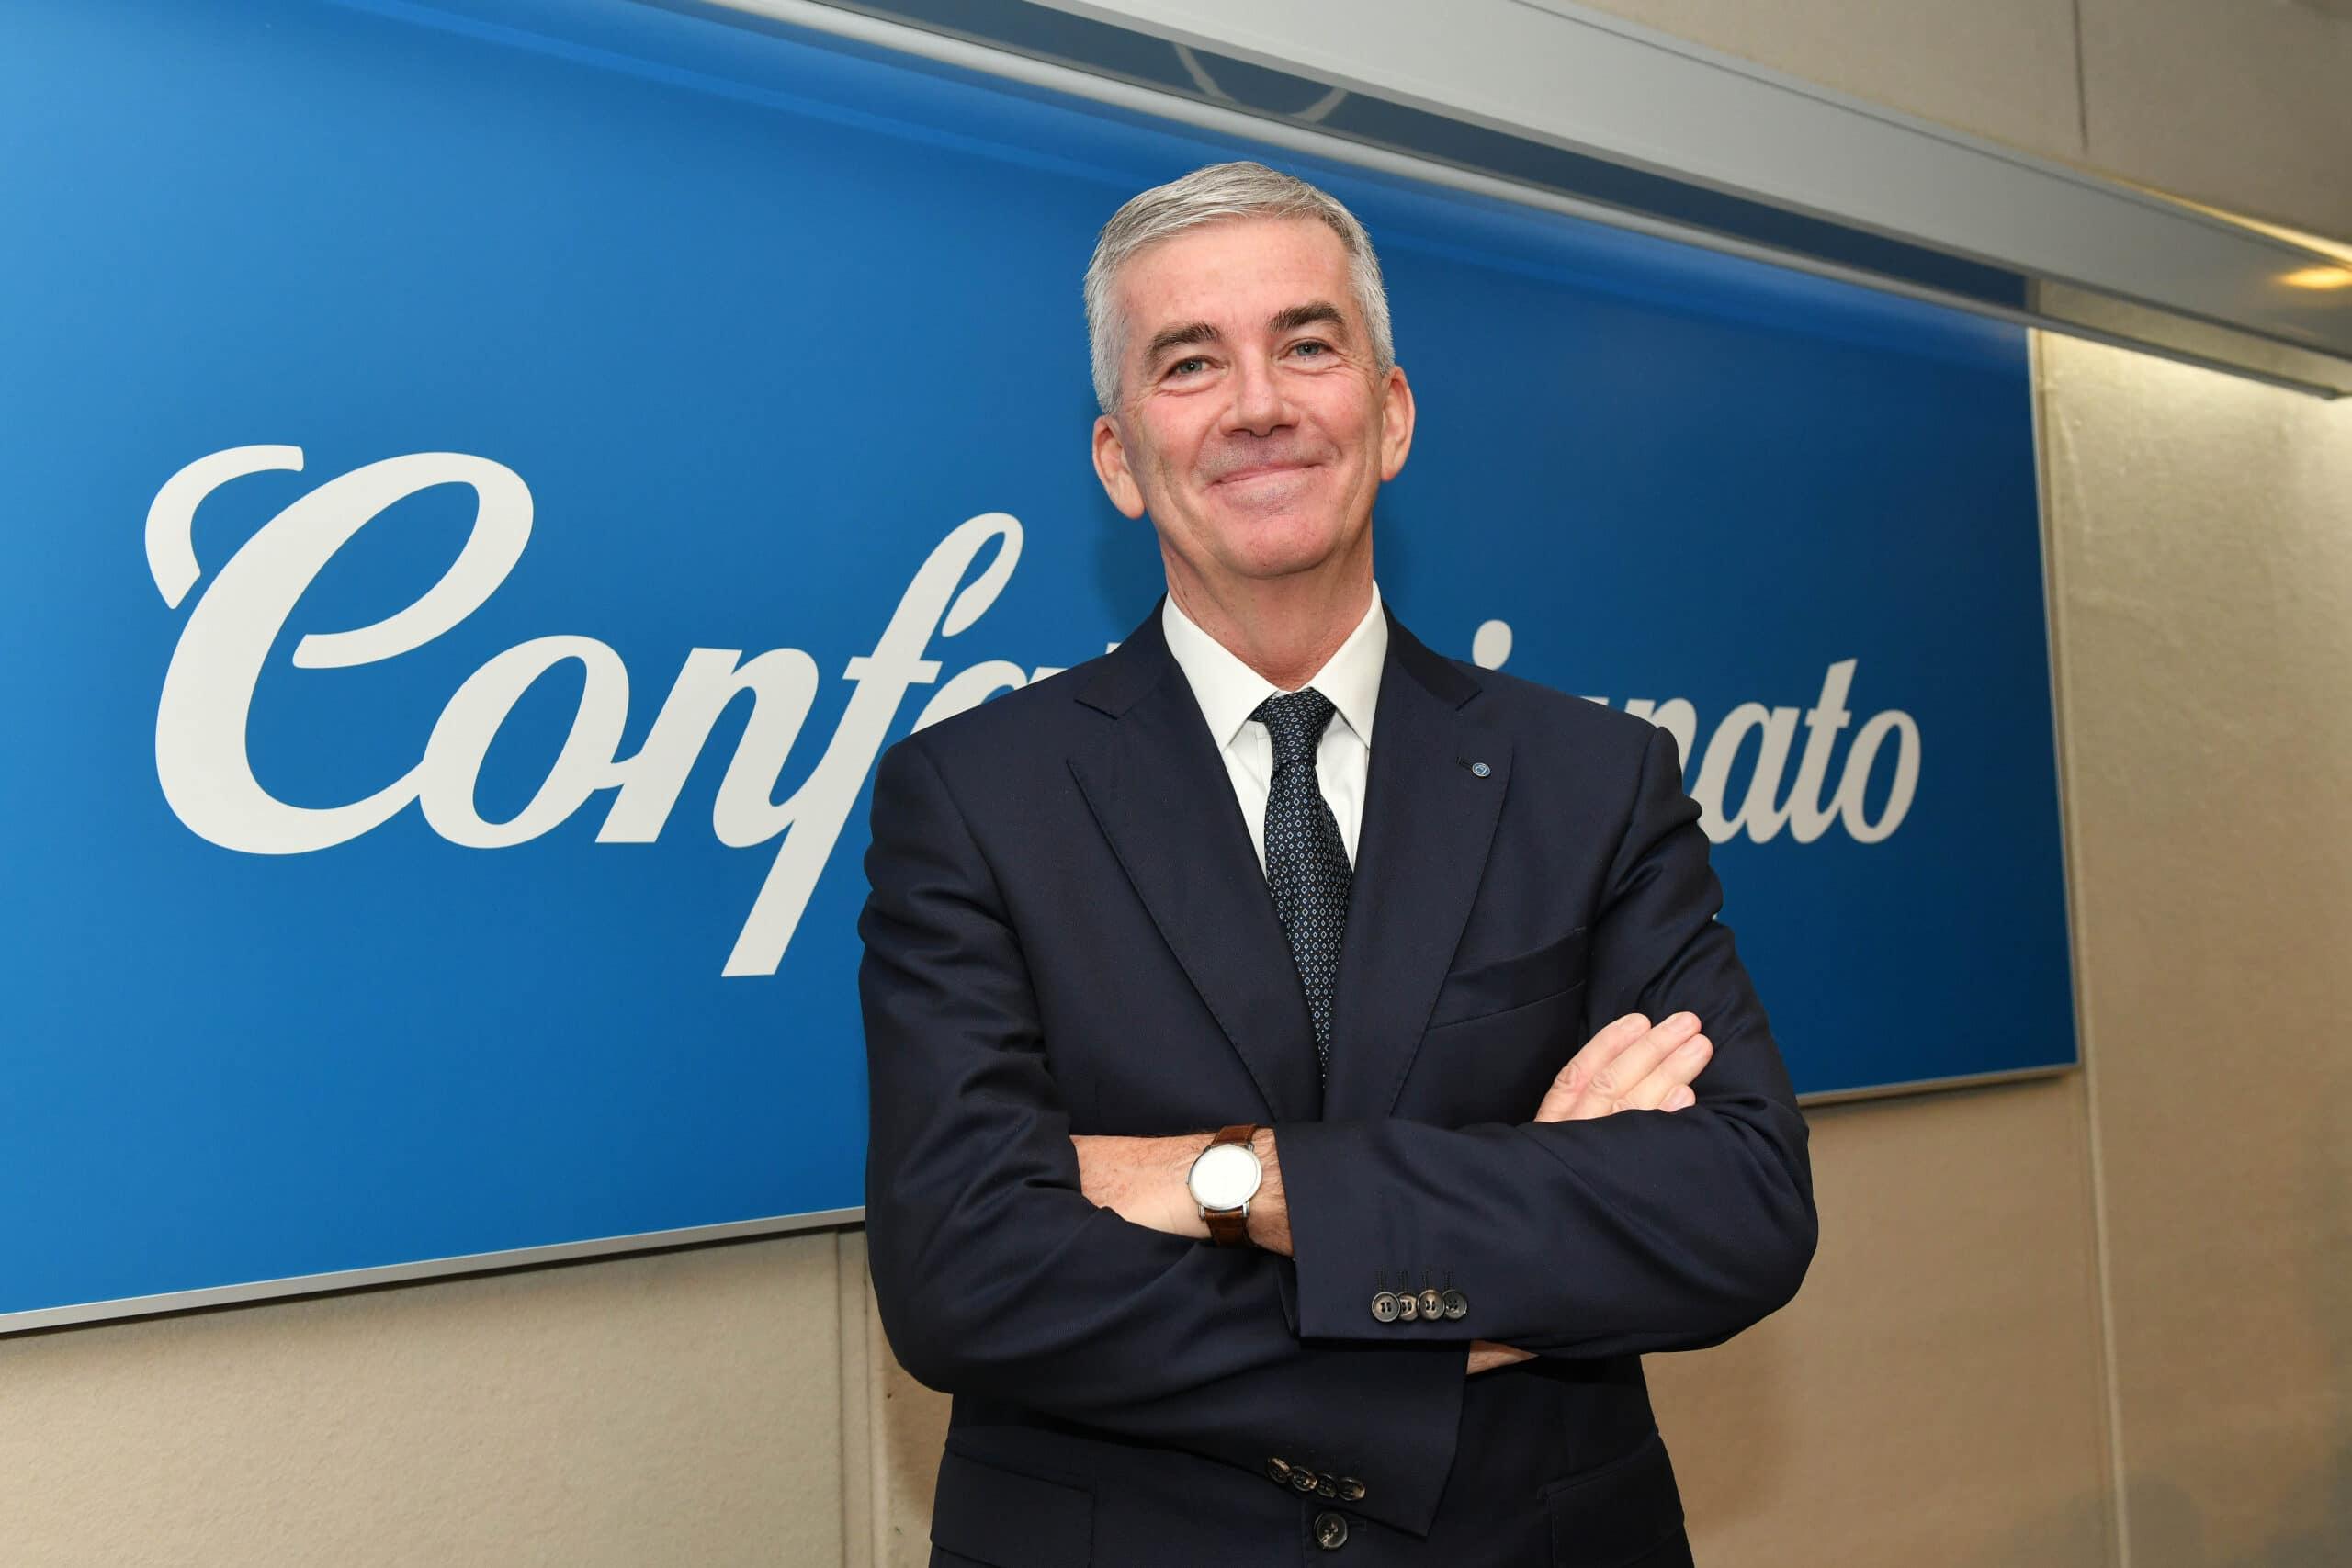 presidente Confartigianato marco Granelli